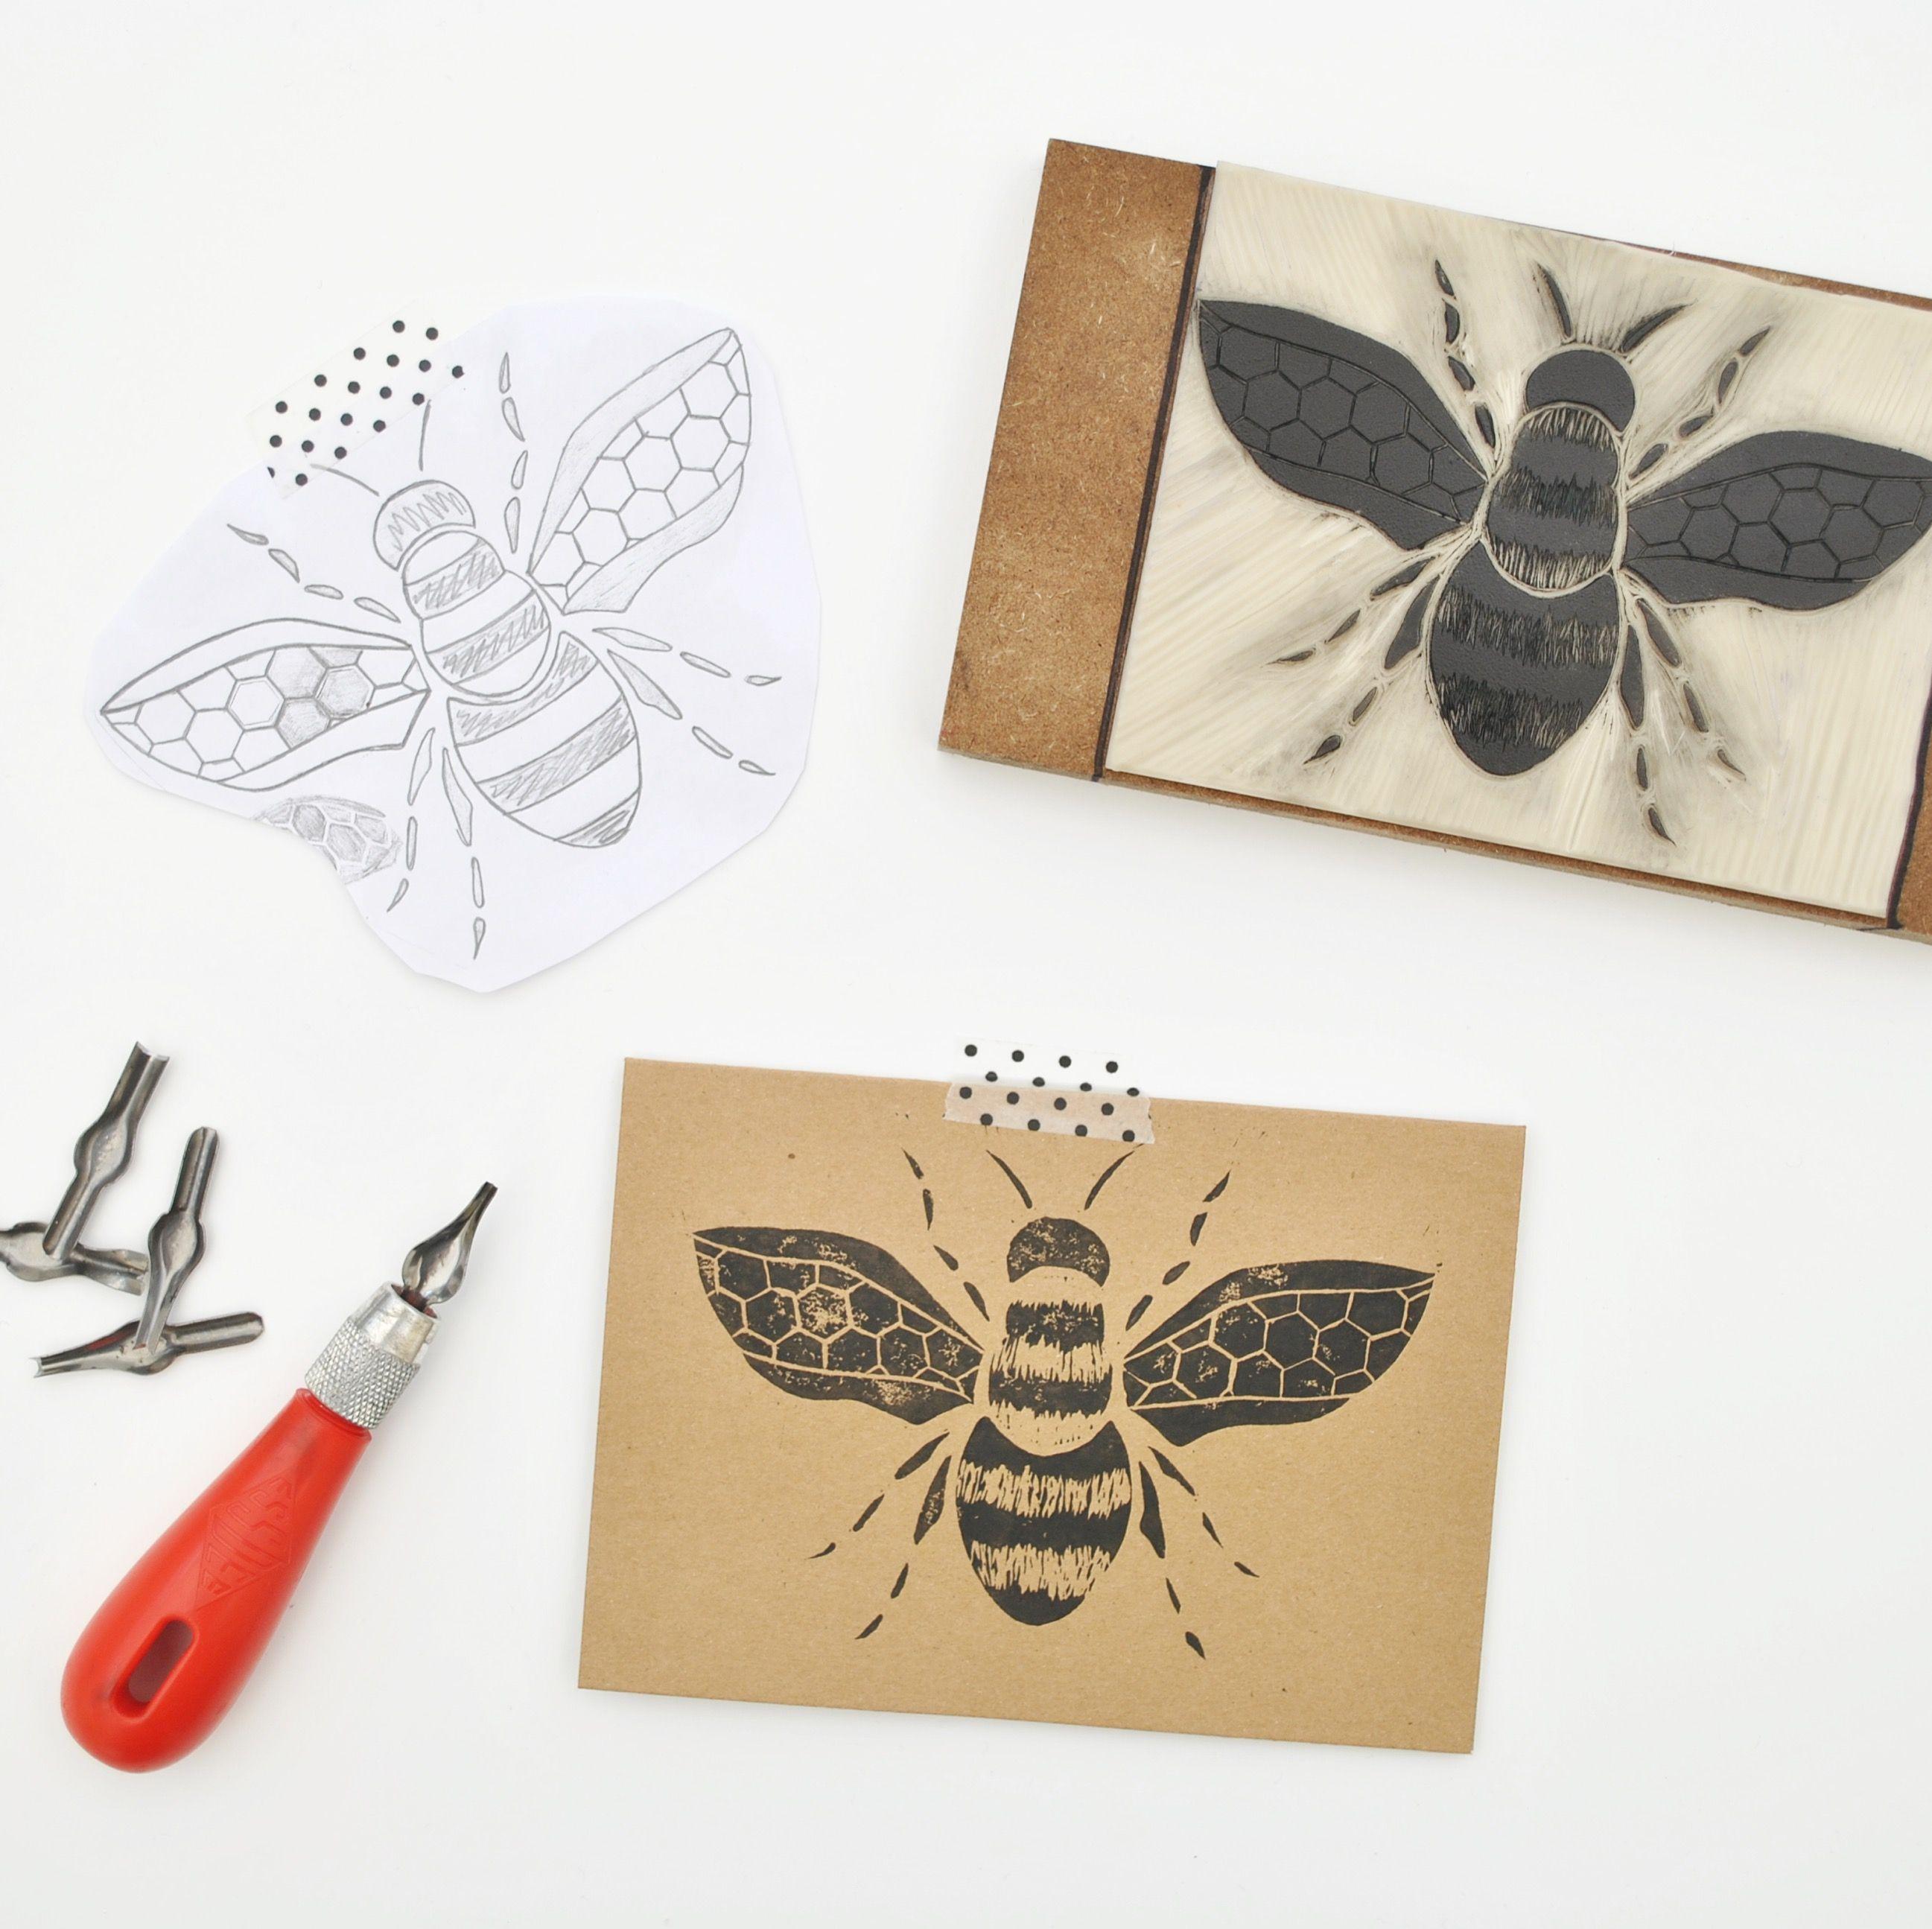 Bumble Bee Print Greetings Cardkraft Card Printsgreeting Cards